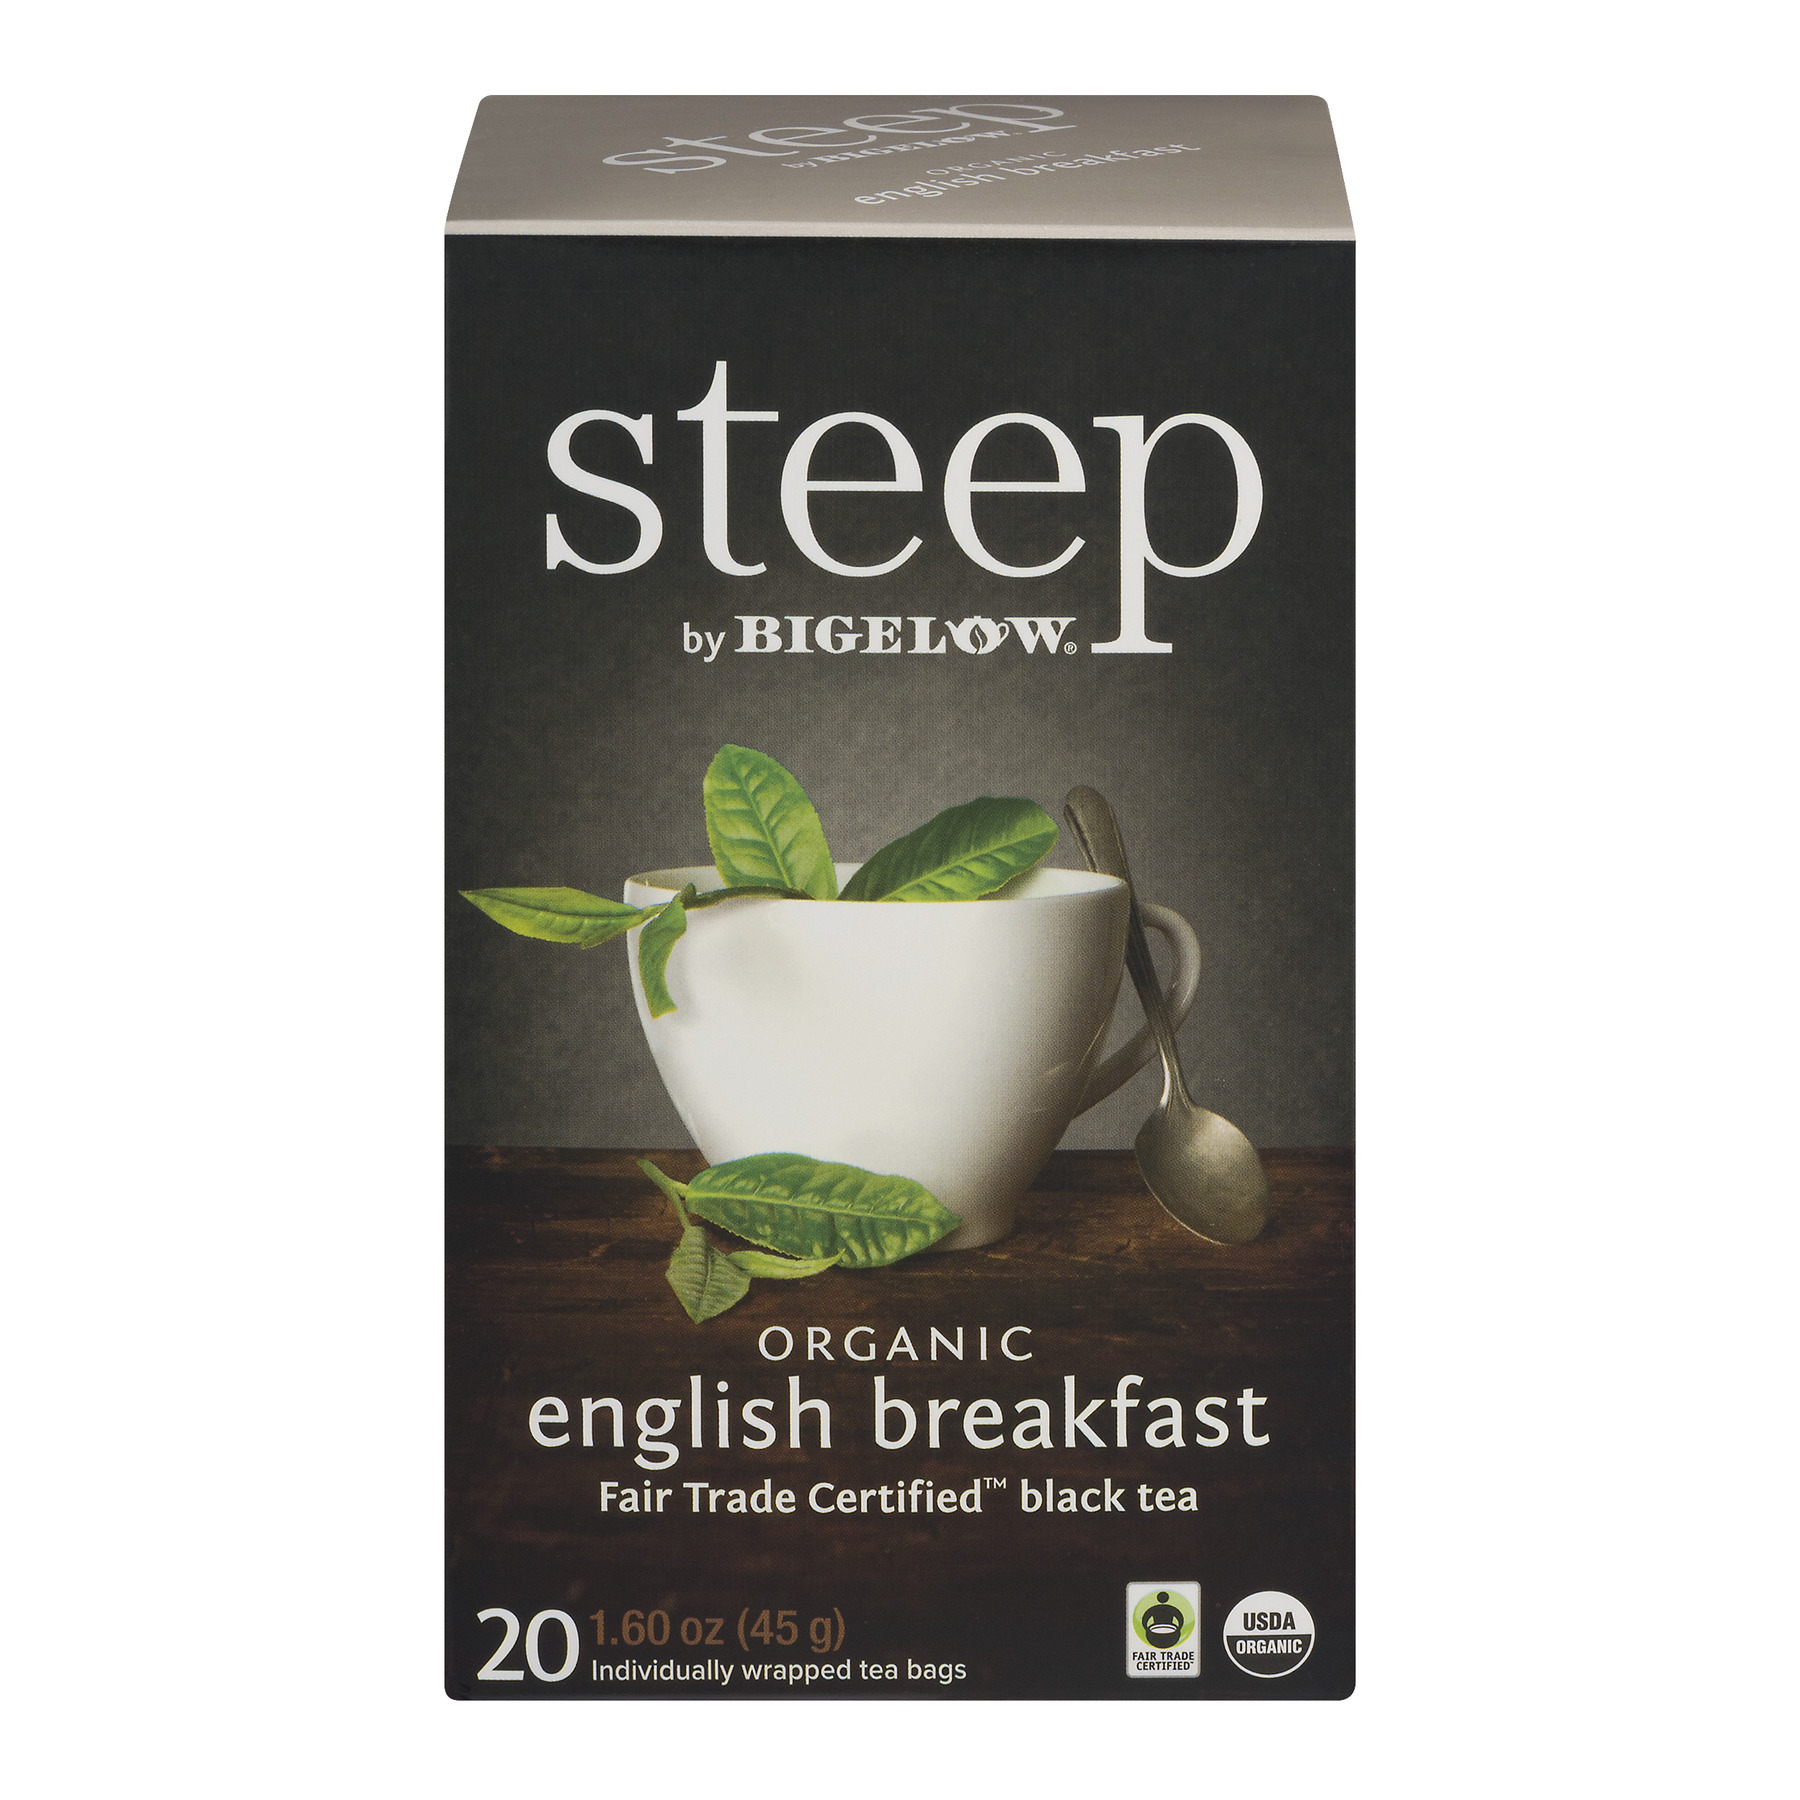 Steep by Bigelow Organic English Breakfast Tea - 20 CT20.0 CT